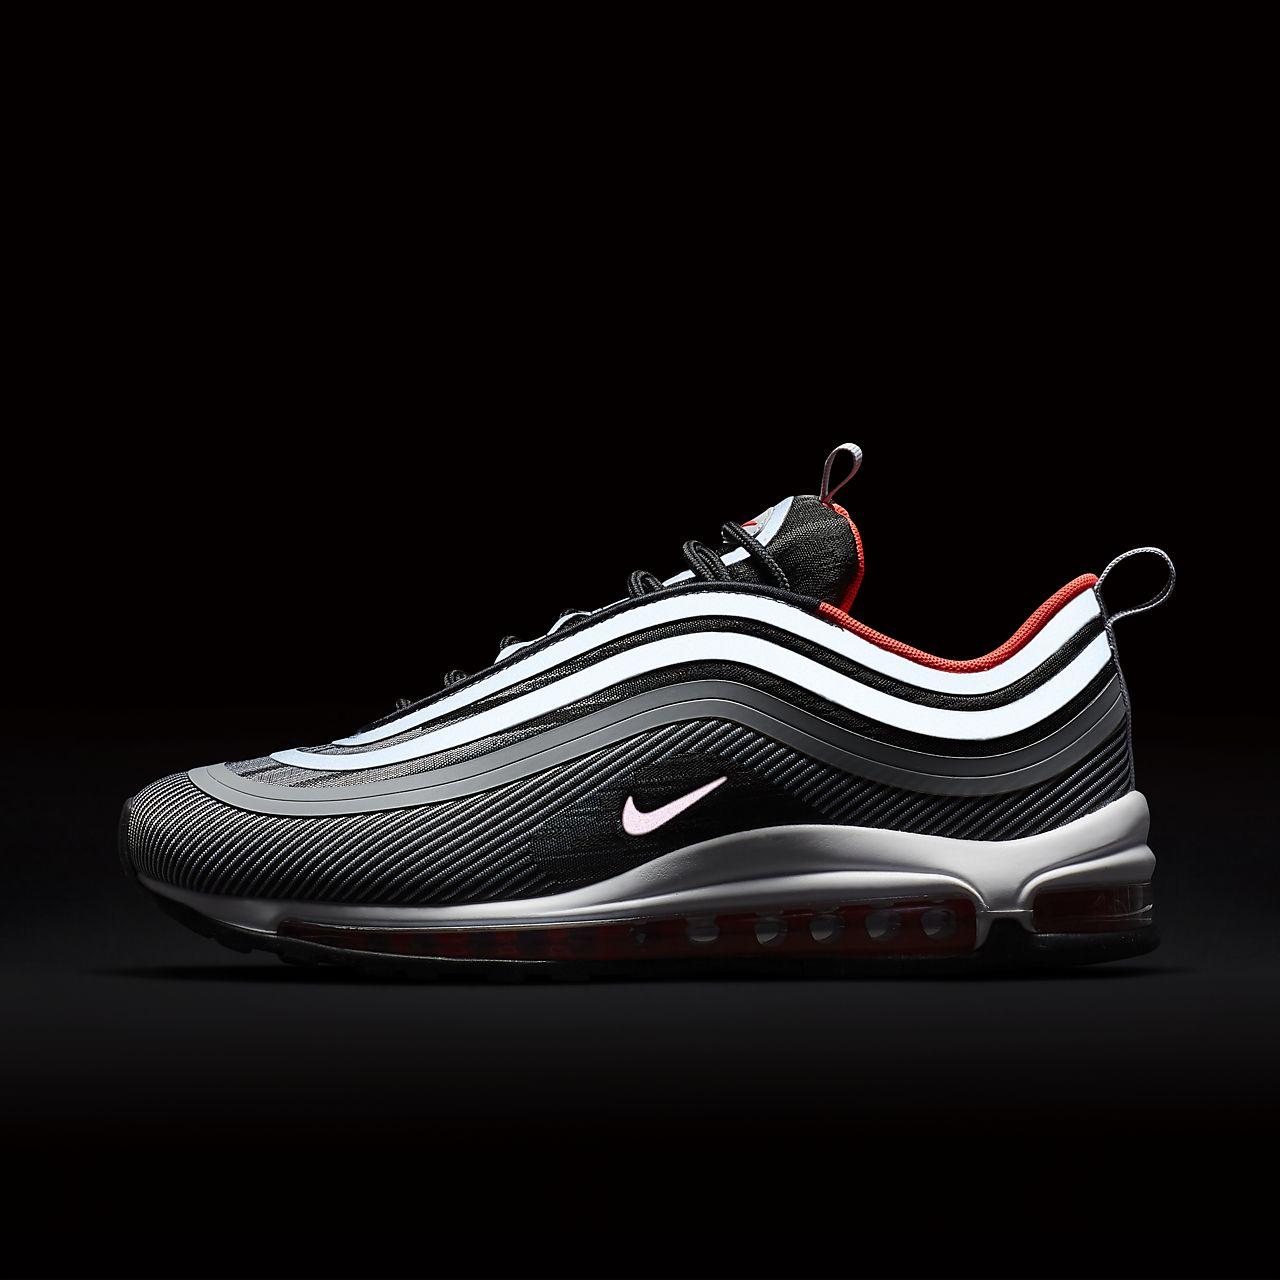 636e66a6b3e9c Nike Air Max 97 Ultra '17 Men's Shoe. Nike.com ID